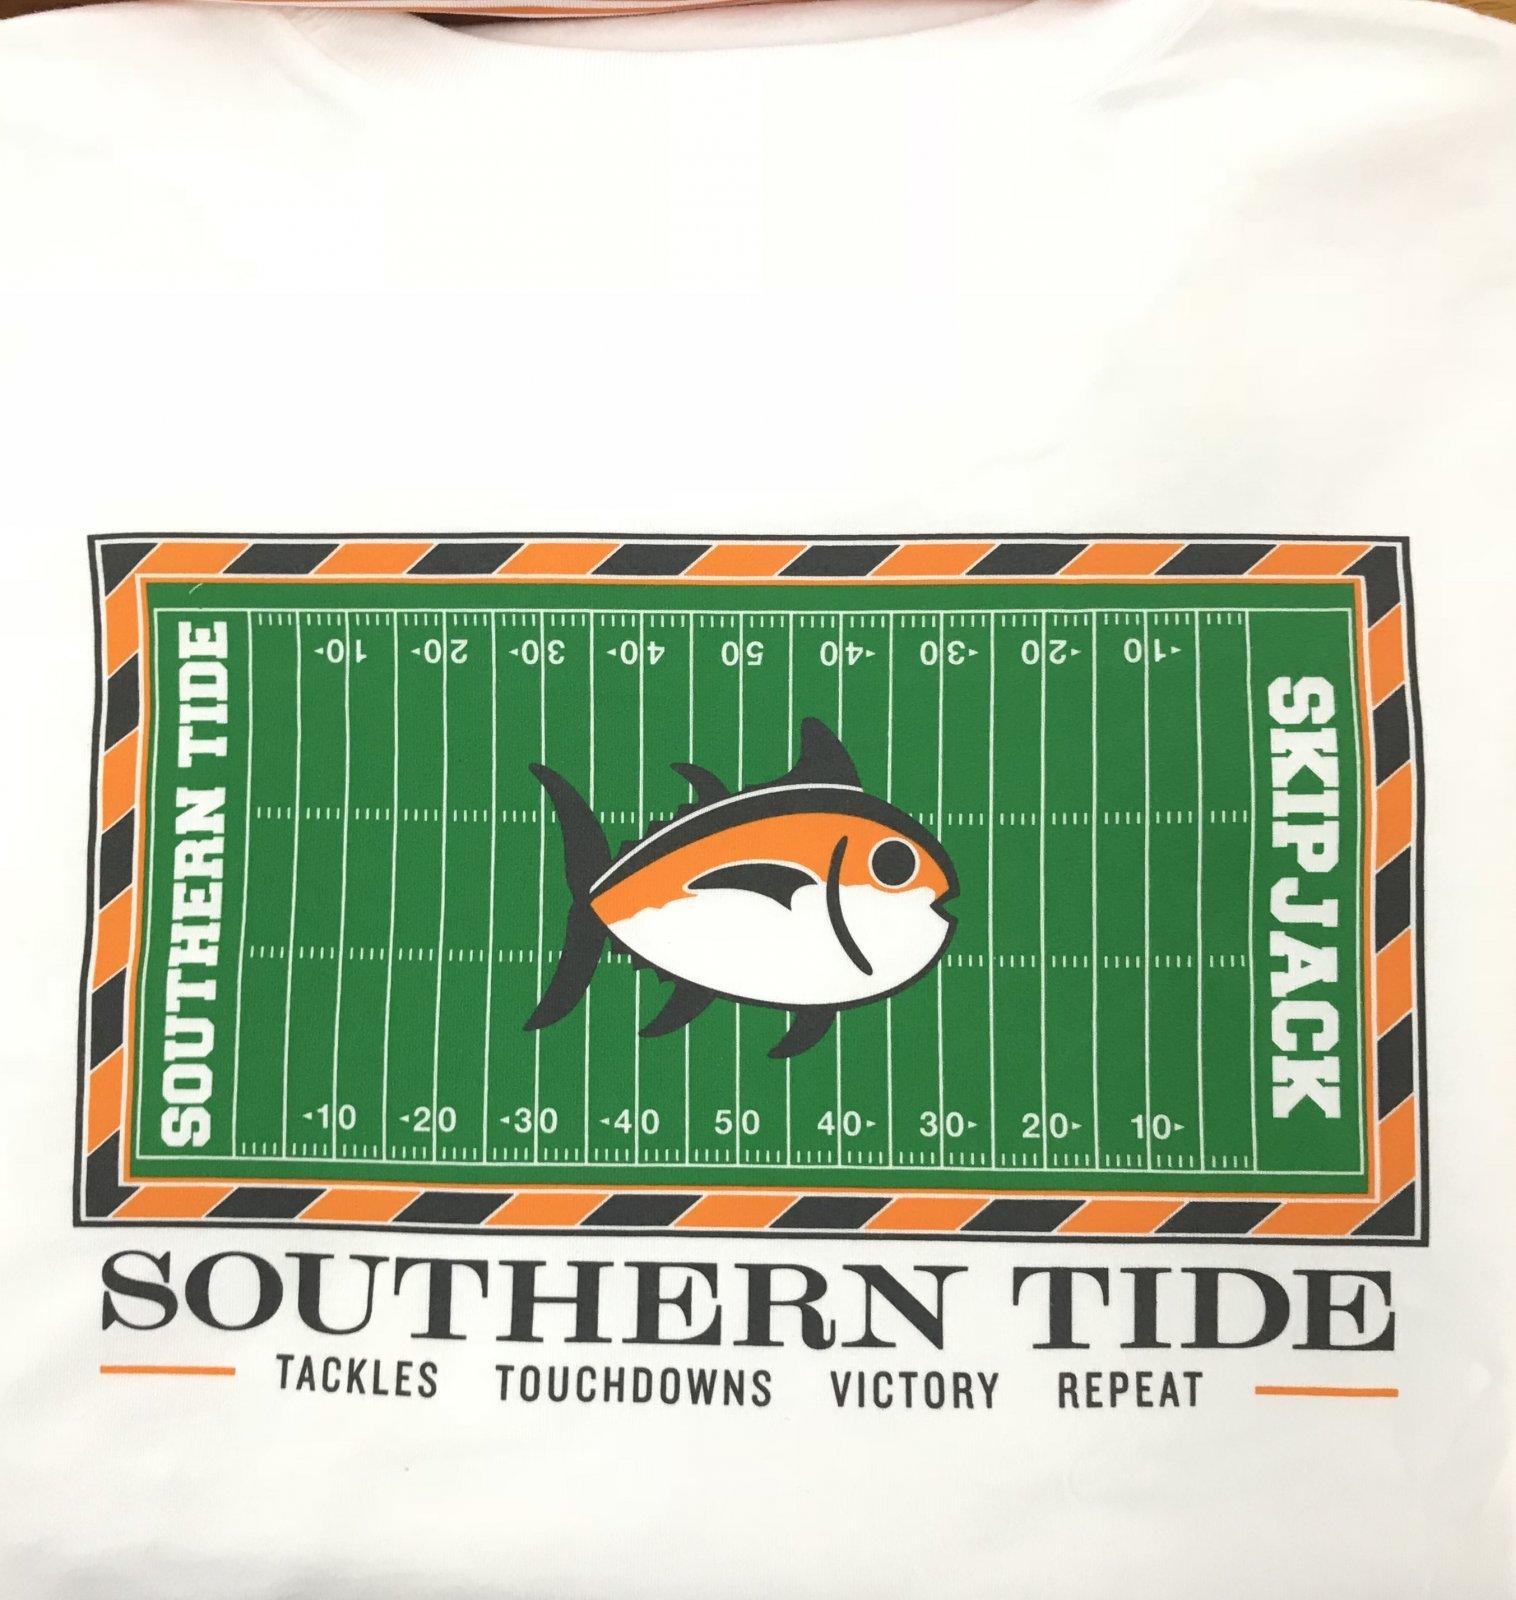 ST LS Gameday Football Stadium T-Shirt